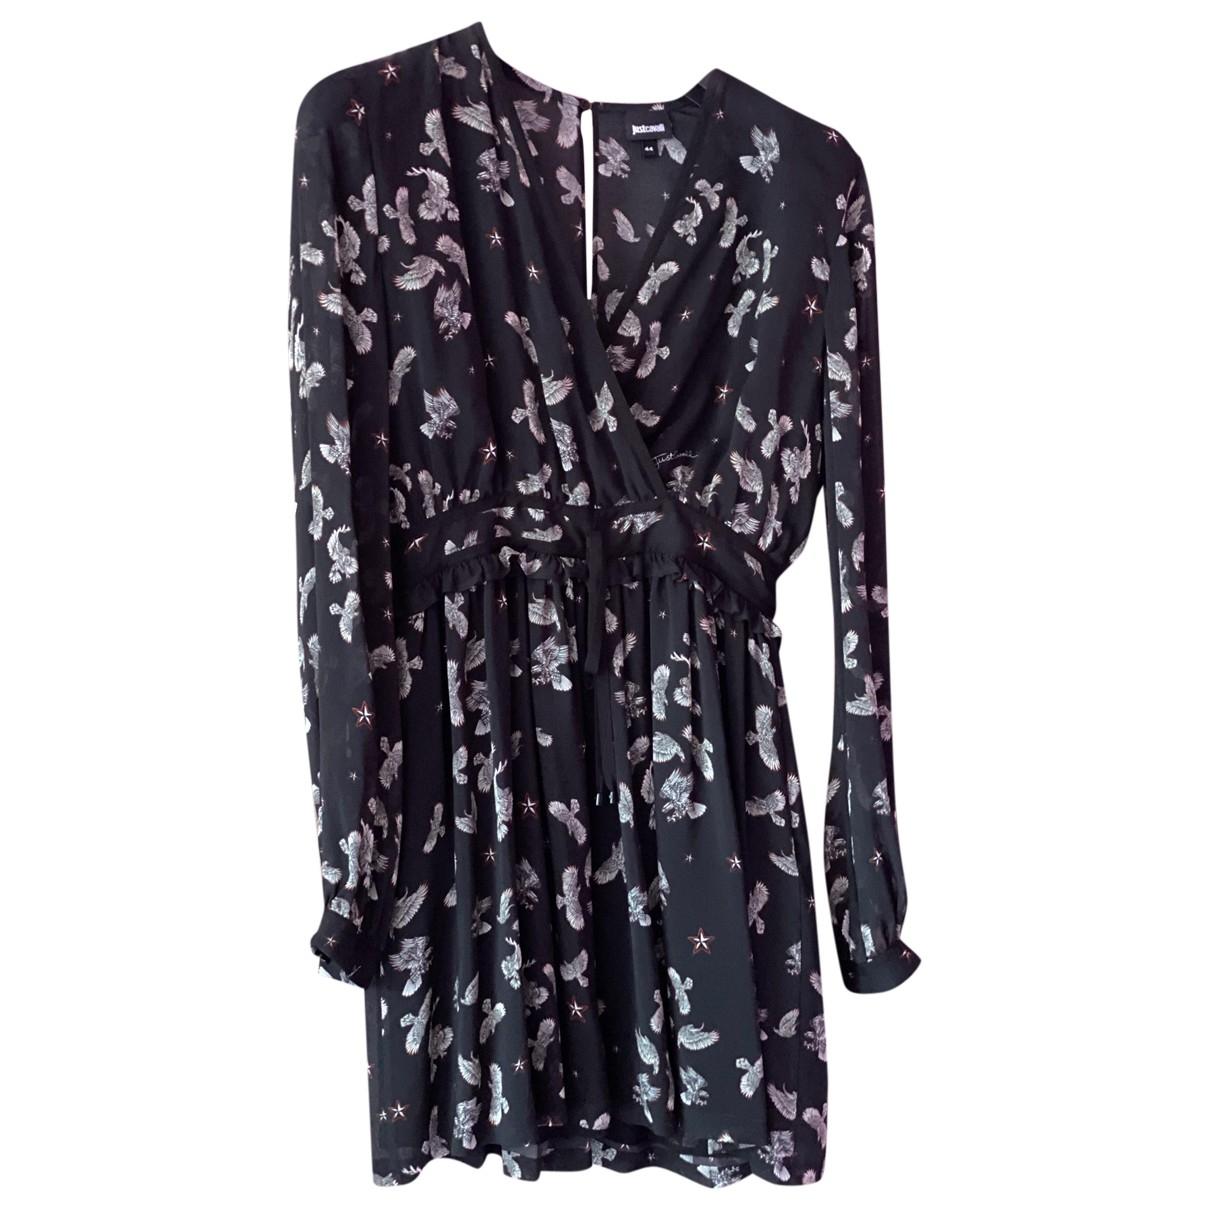 Just Cavalli \N Black dress for Women 44 FR